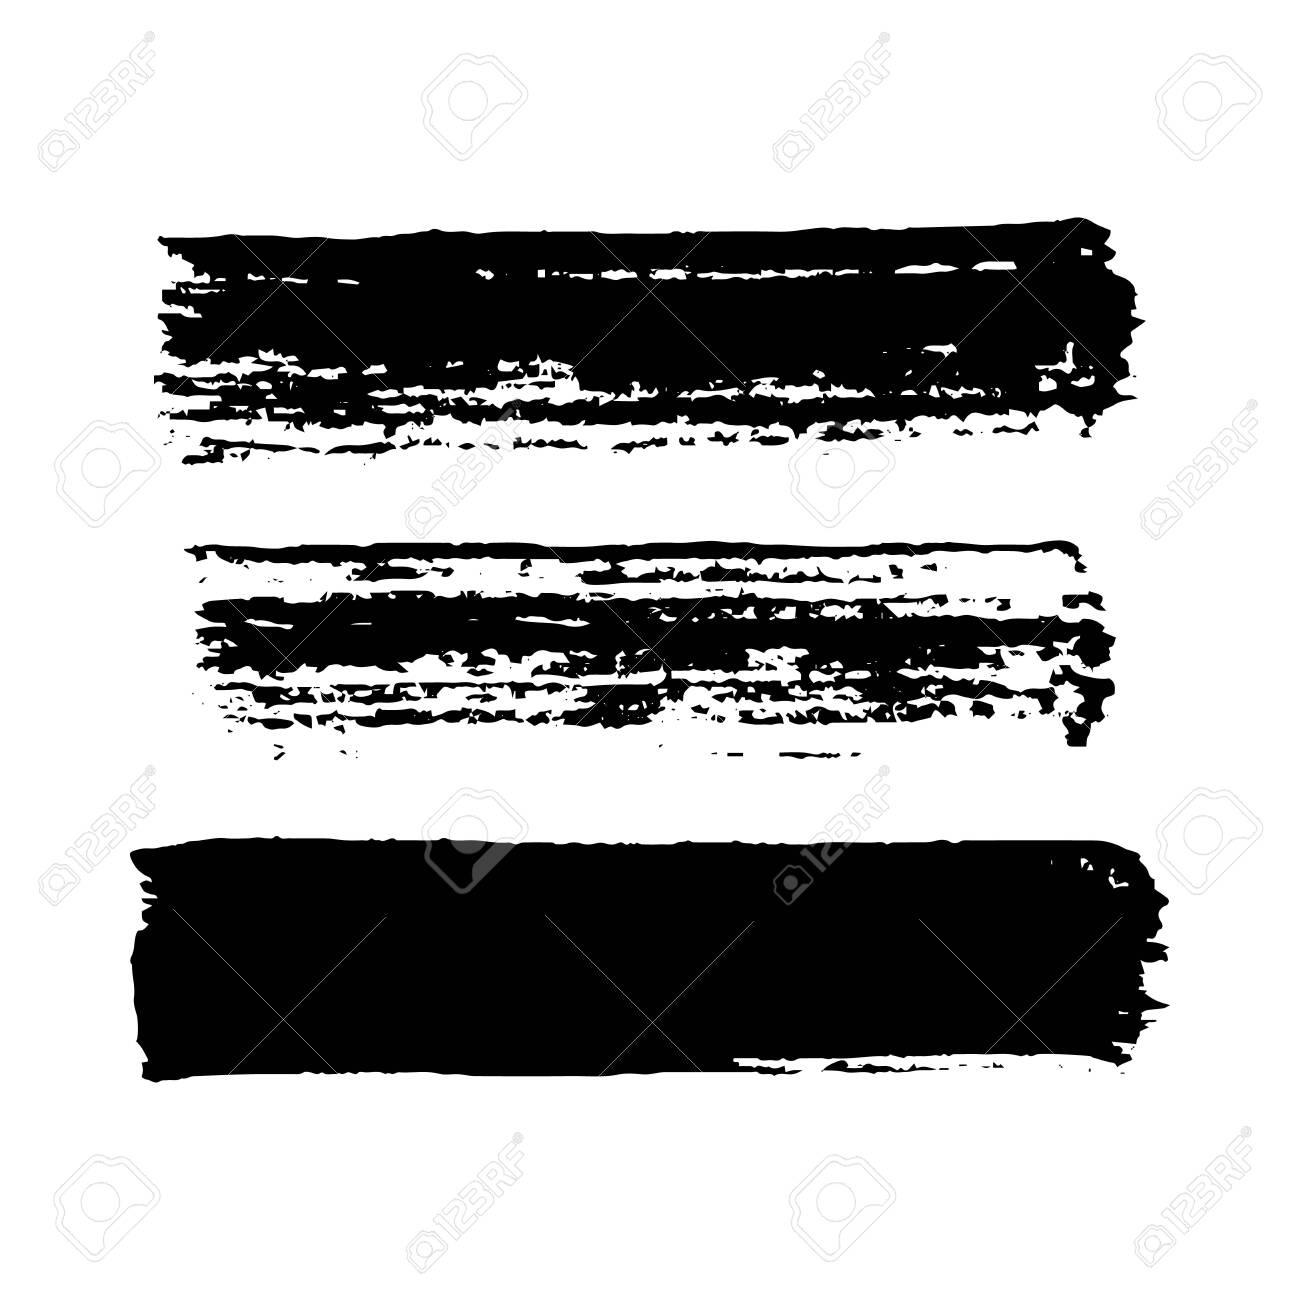 Black grunge brush strokes. Set of three painted brush ink stripes. Ink spot isolated on white background. Vector illustration - 152858526